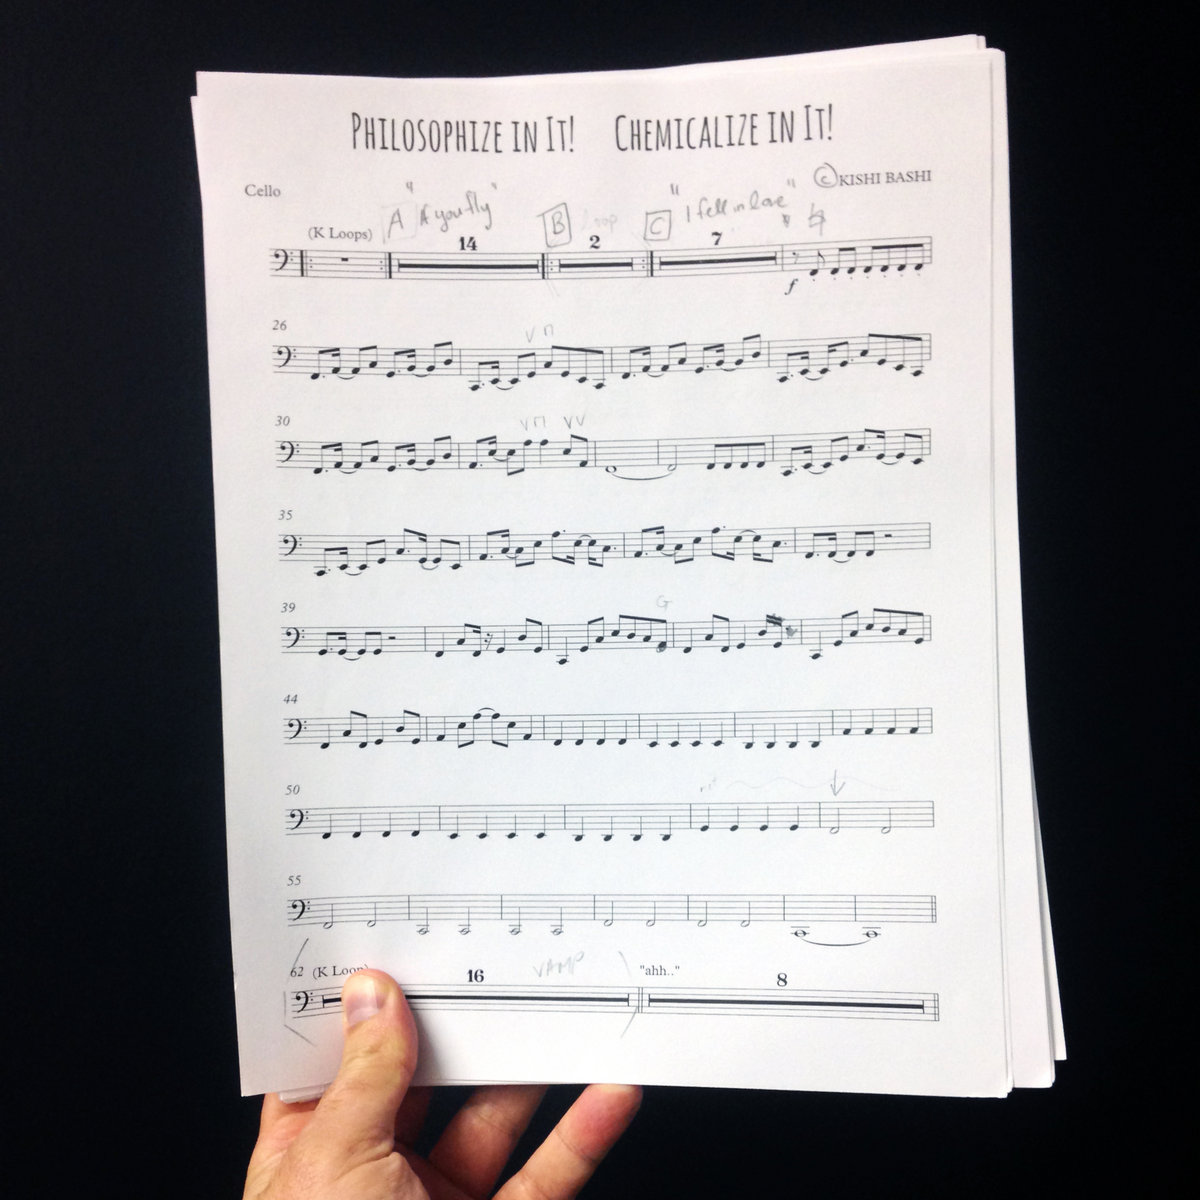 Free Sheet Music String Quartet Pdf String Quartet No 1 Op 27 Grieg Edvard Imslp Petrucci